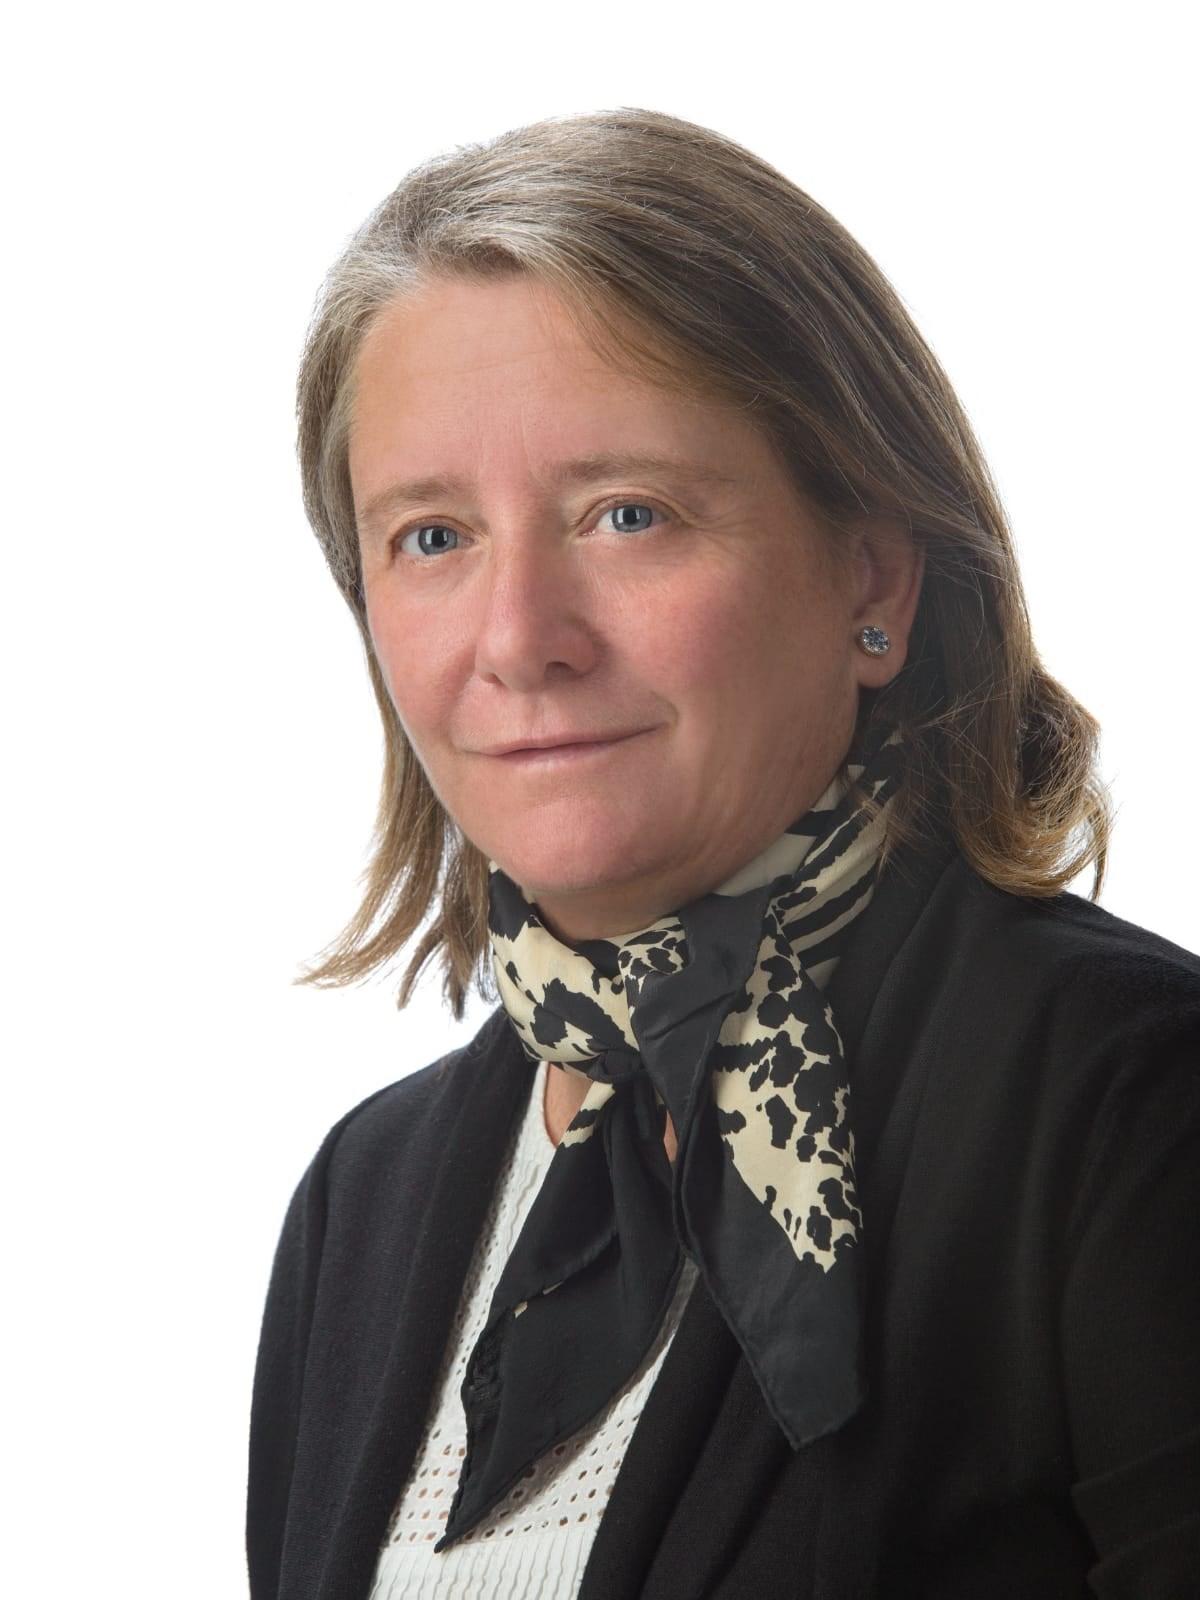 Cristina León Molinari